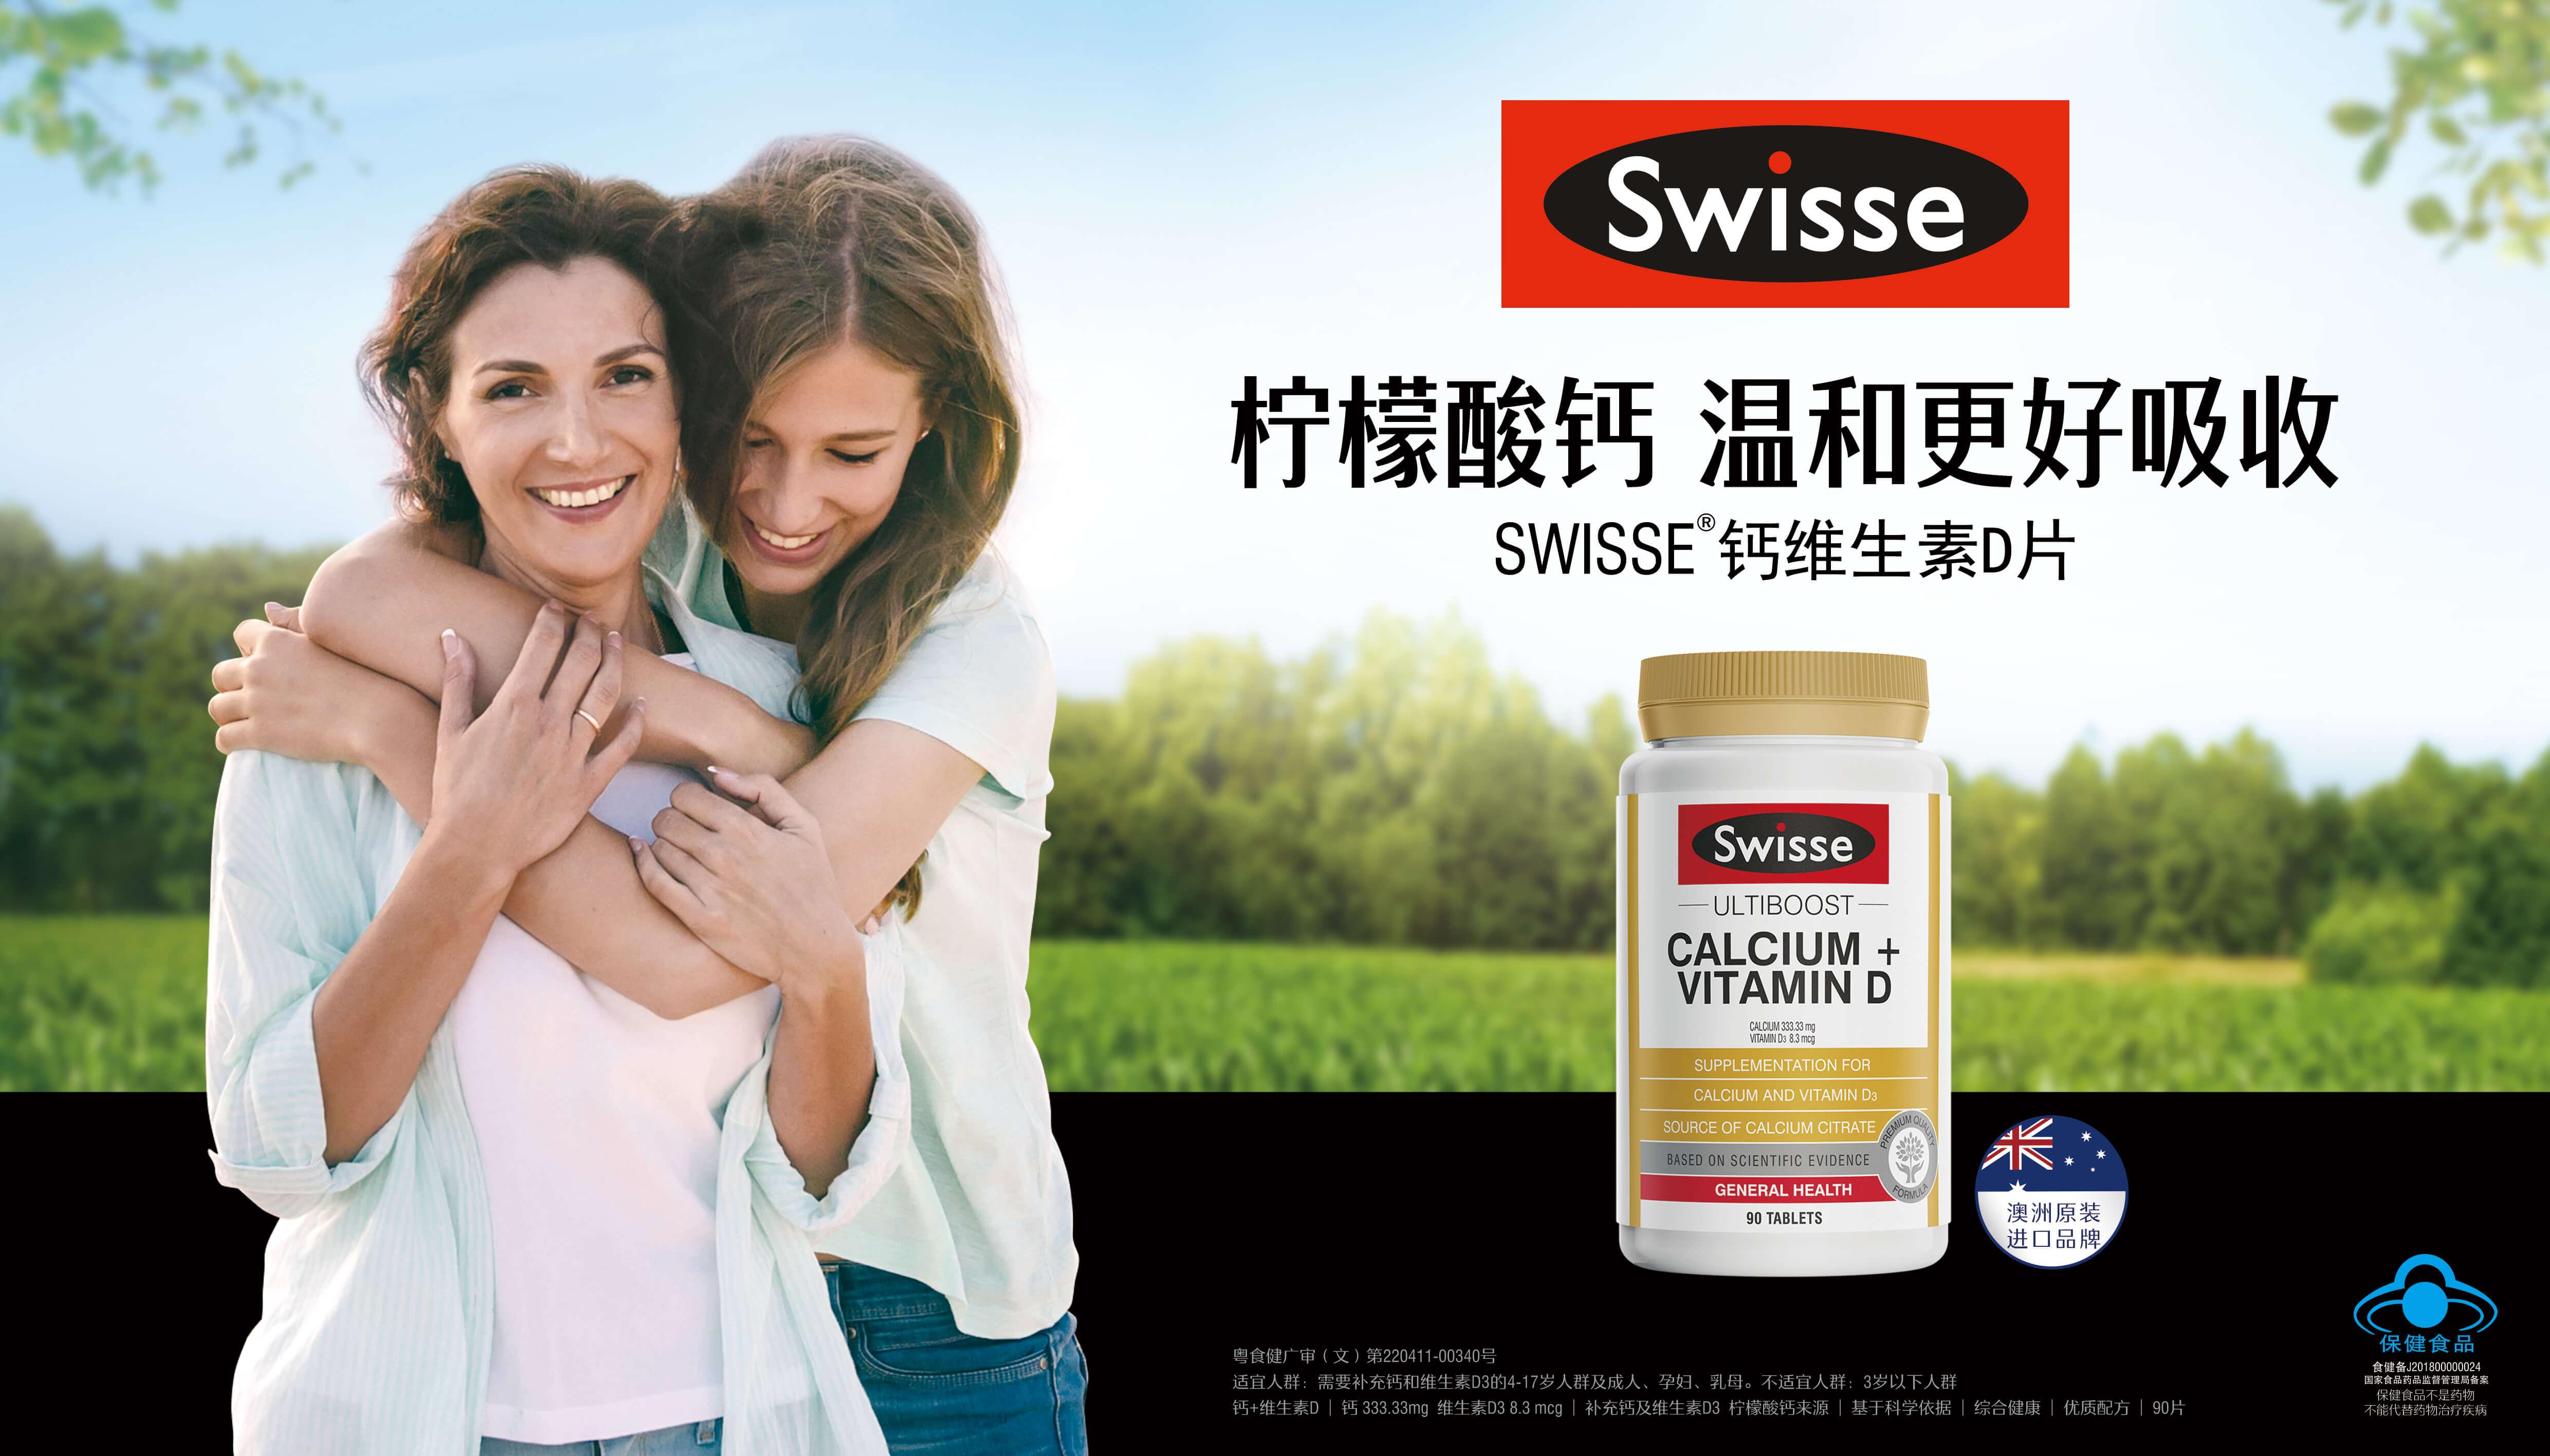 Swisse斯维诗钙片柠檬酸钙好吸收